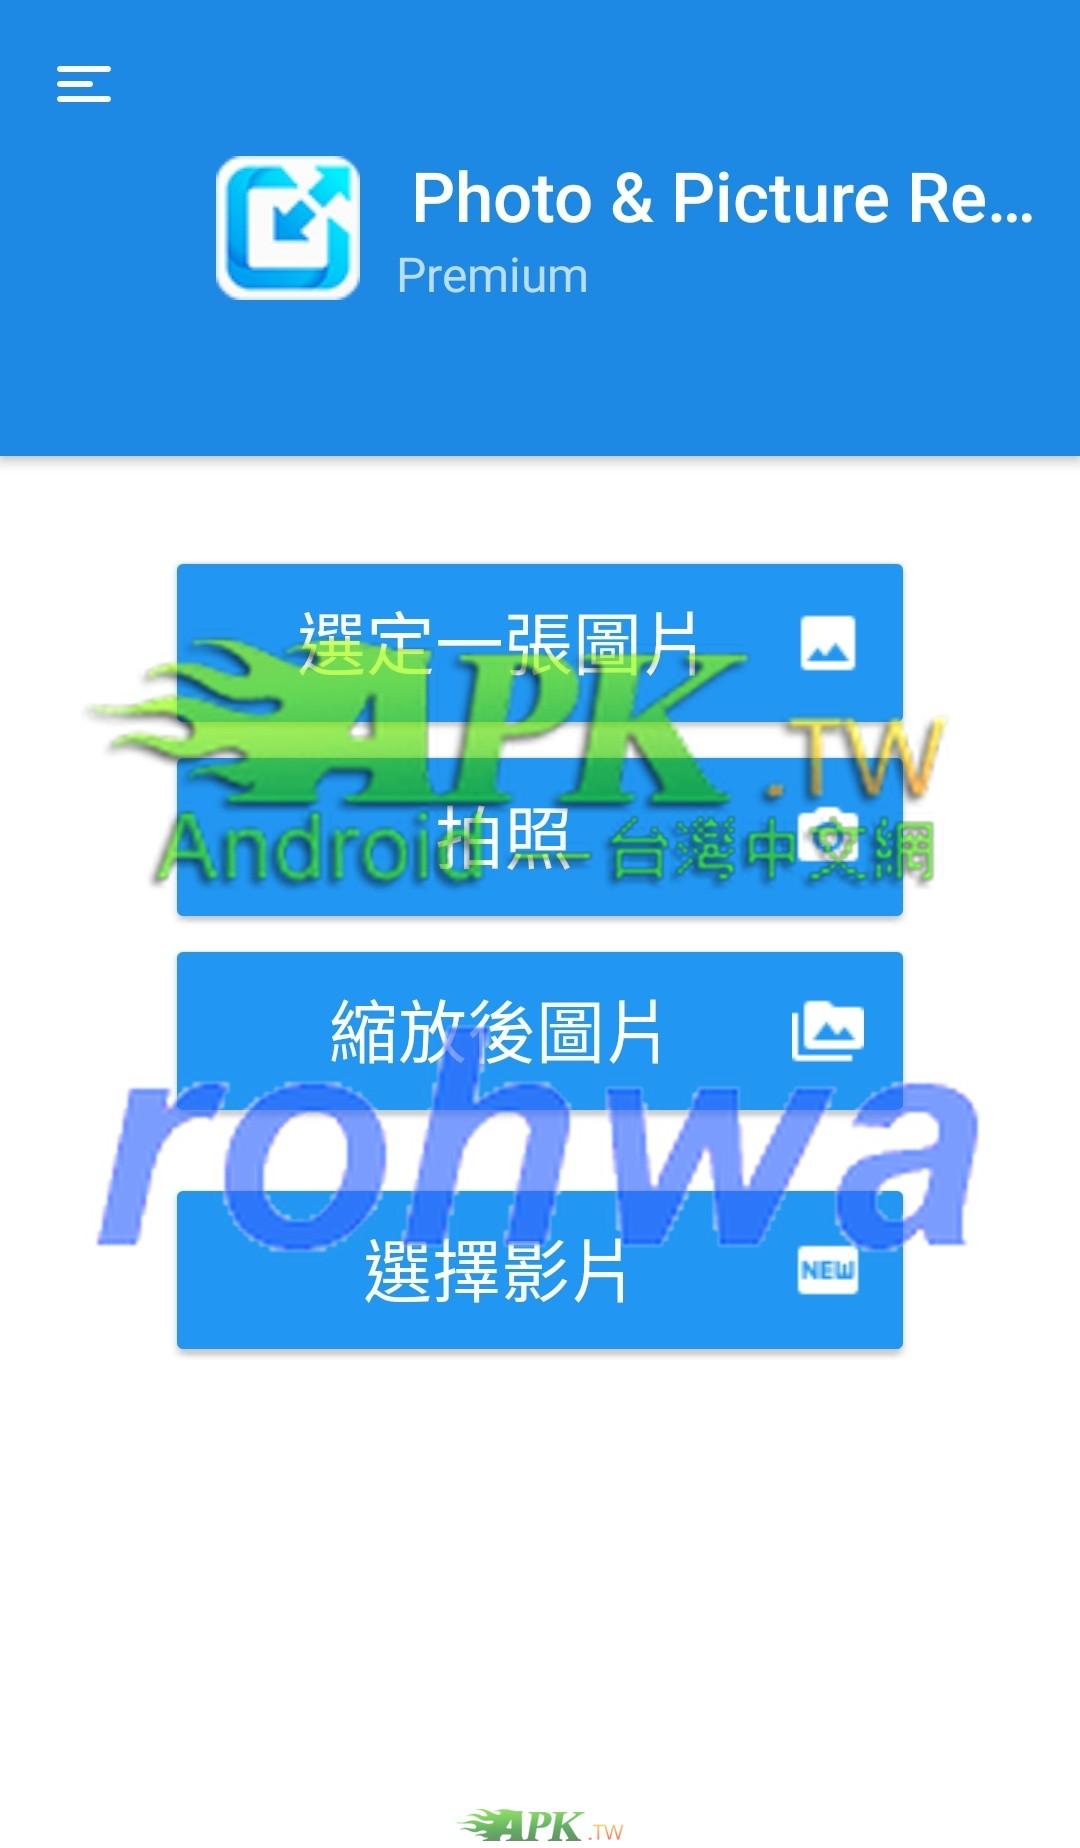 Resizer__1_.jpg